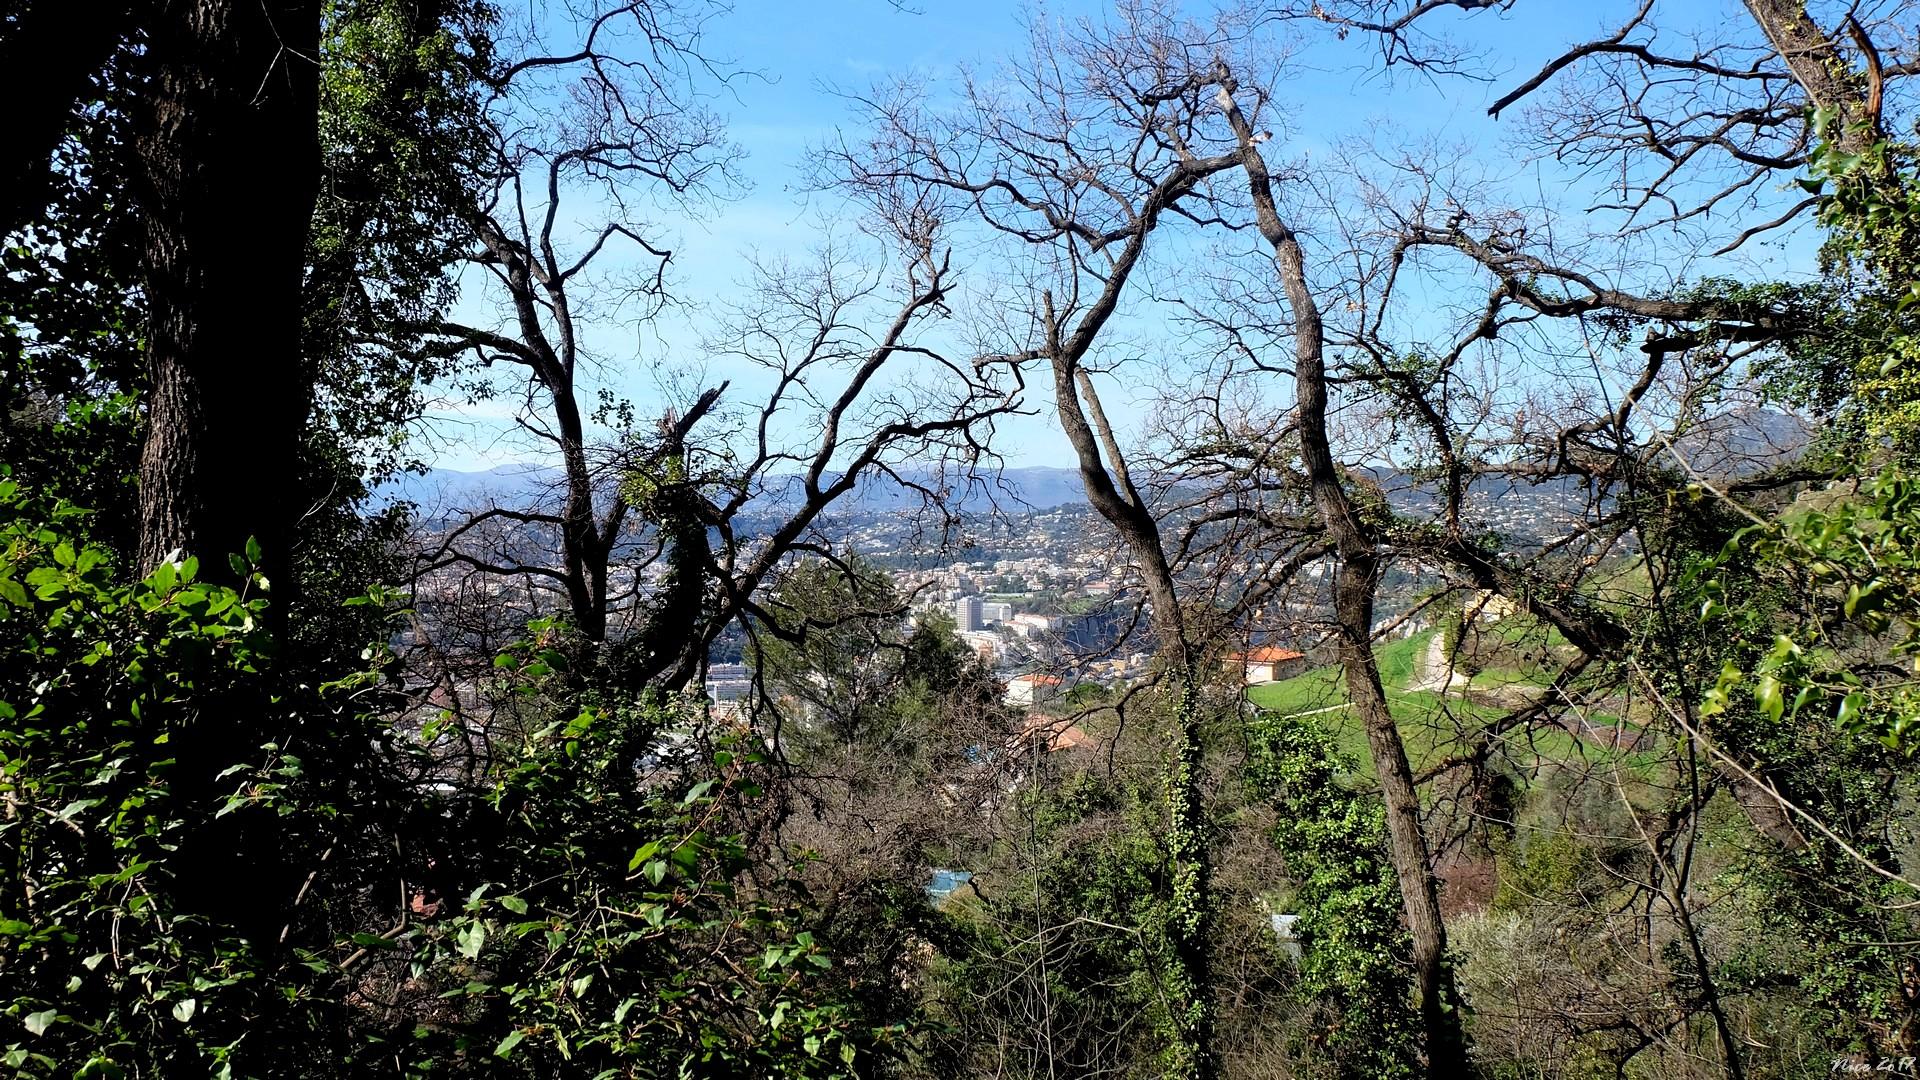 Vinegard Park, Nice, France